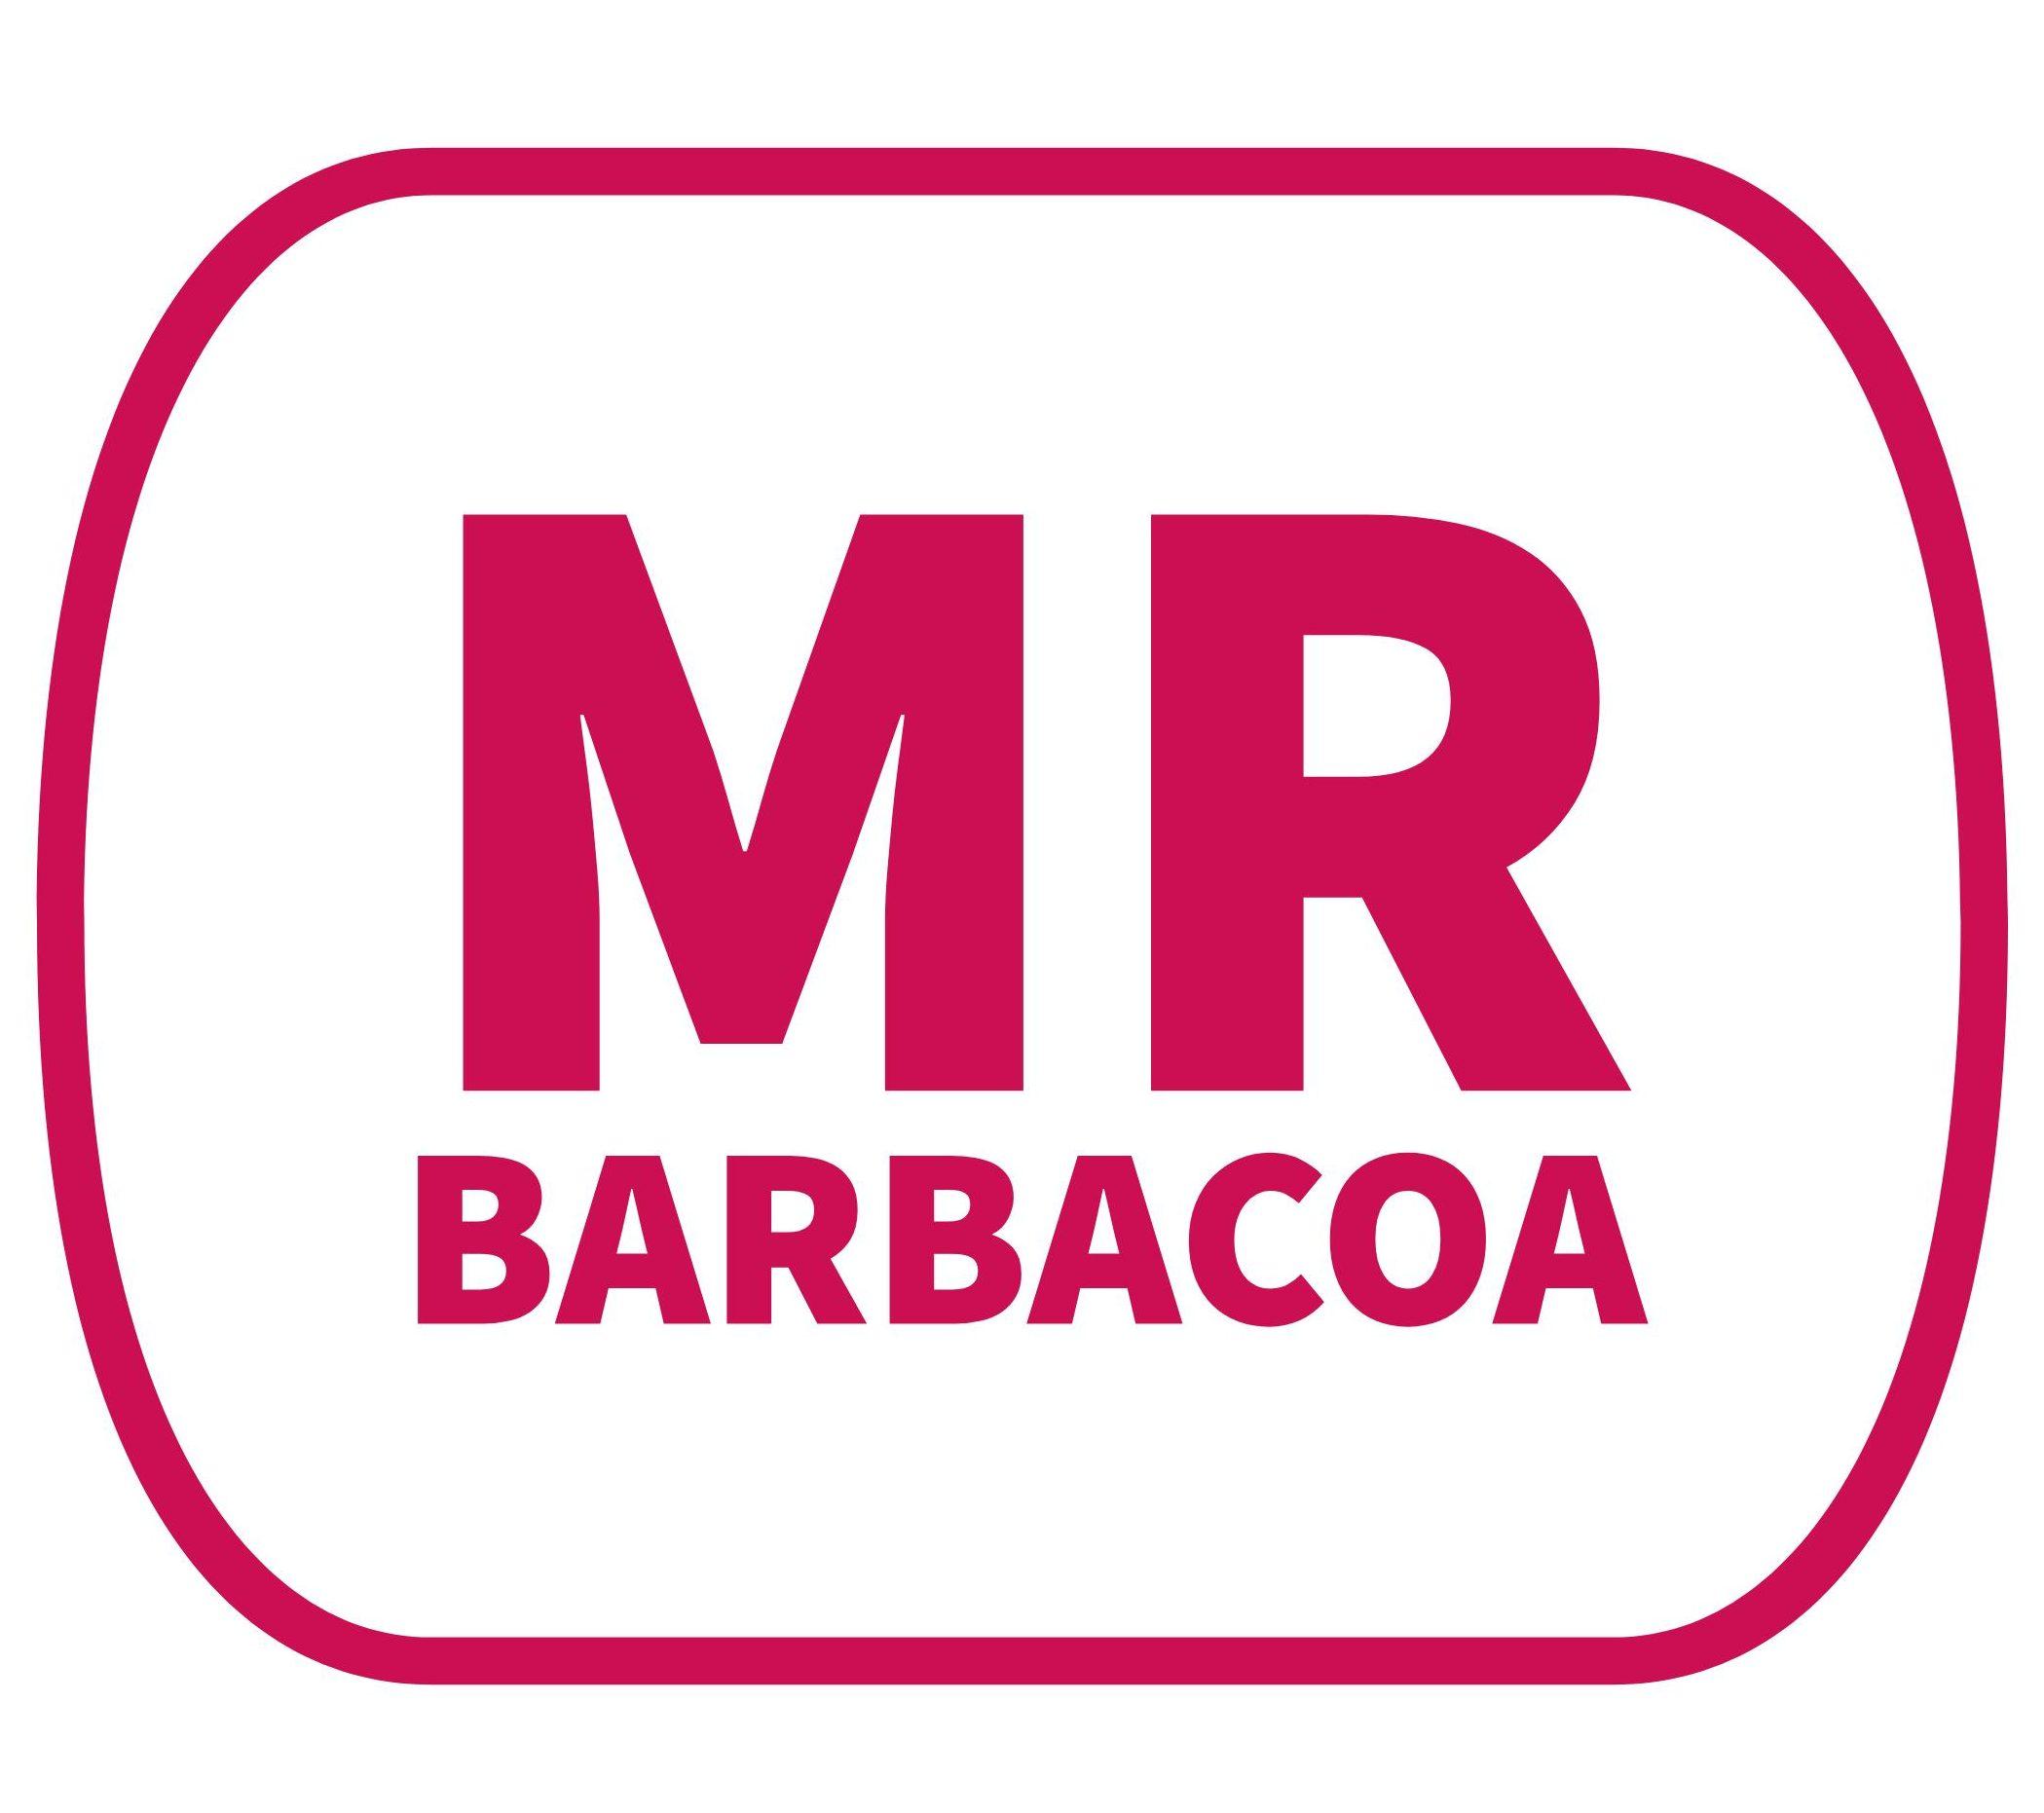 Mr Barbacoa